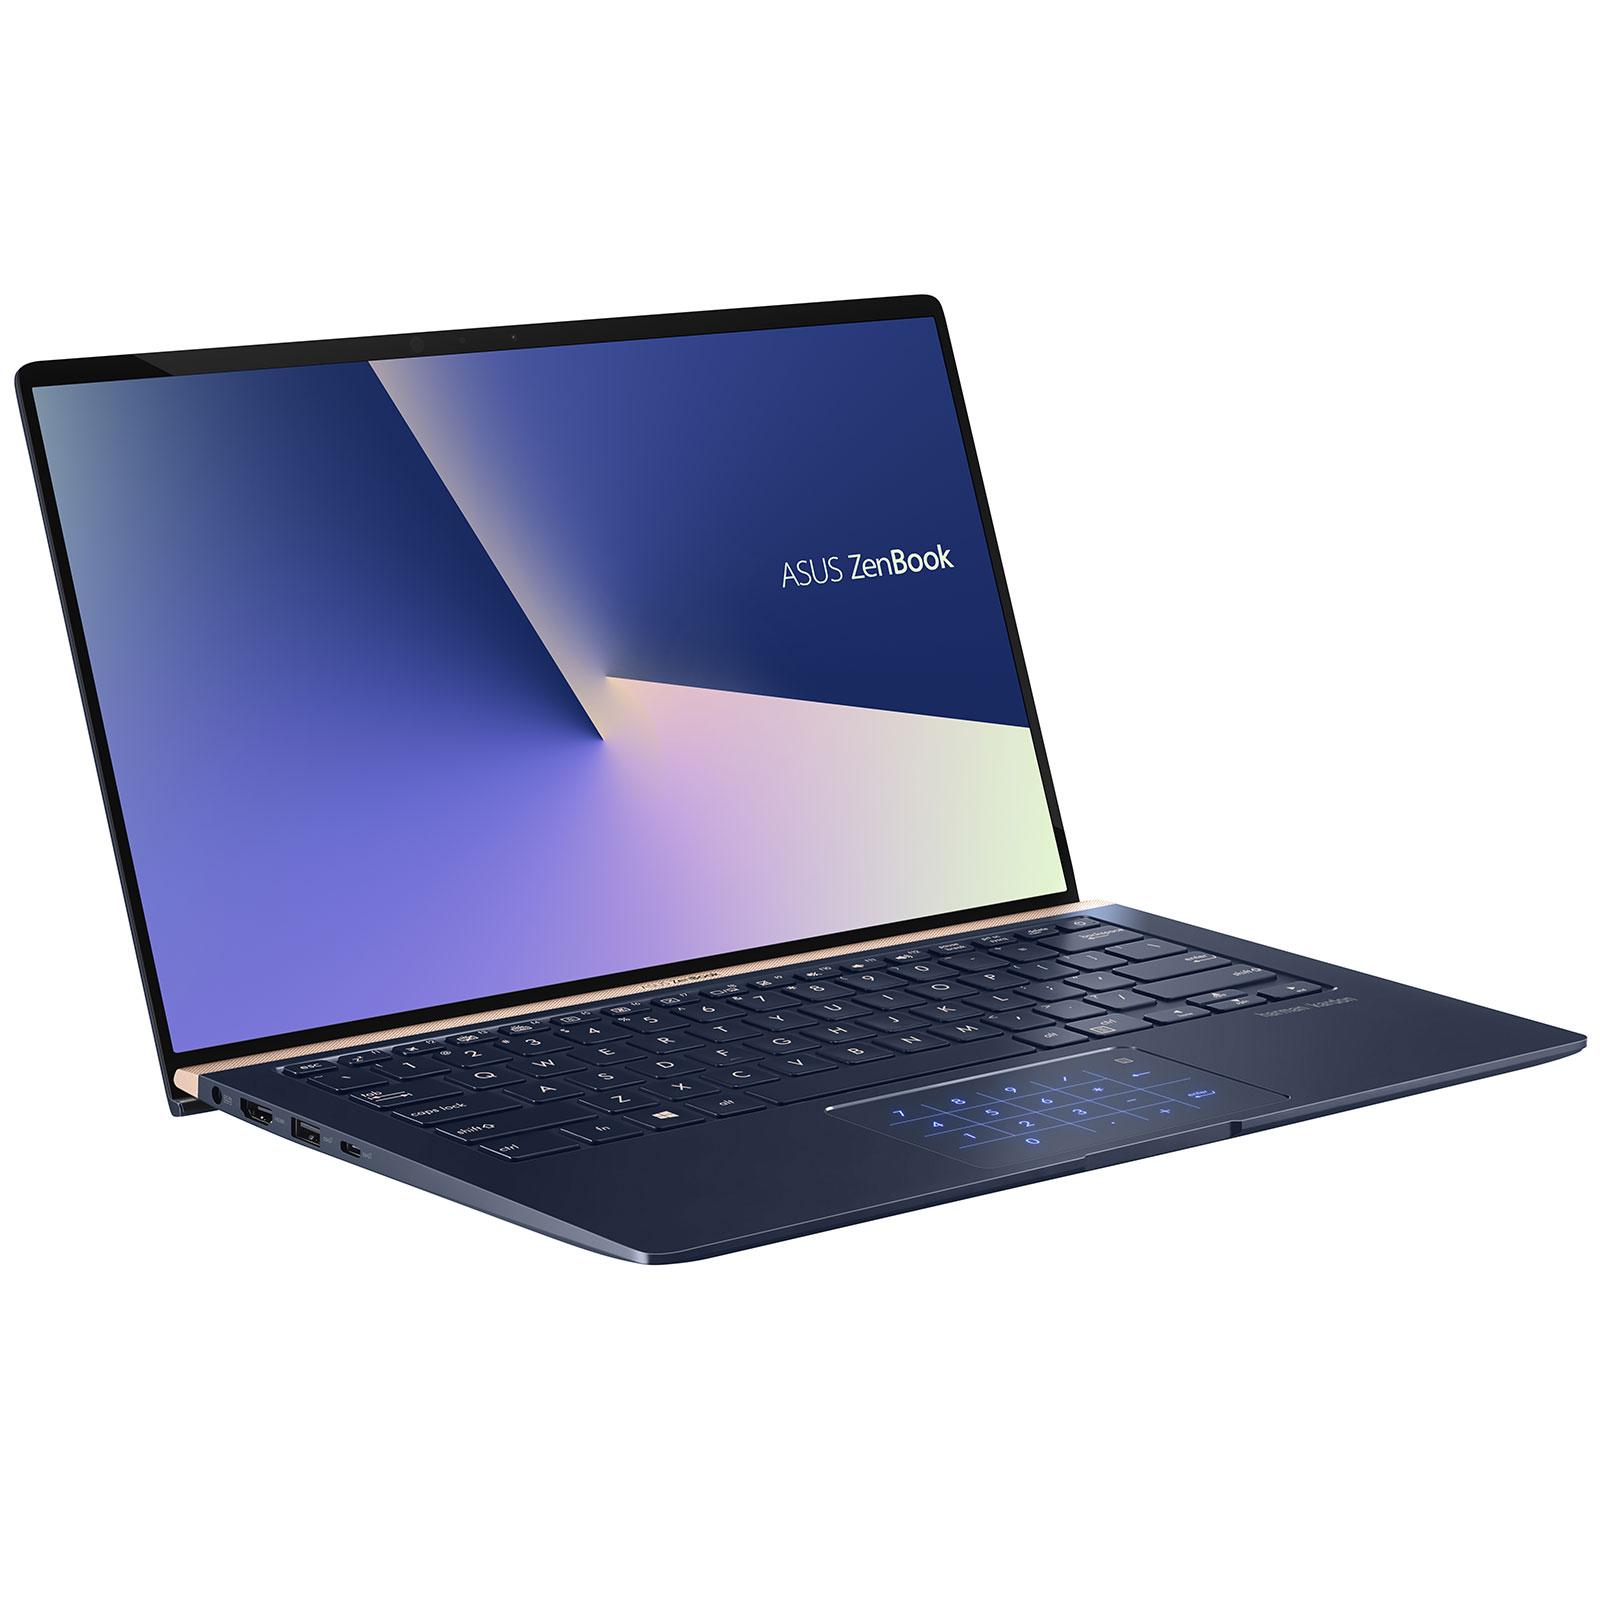 "PC portable ASUS Zenbook 14 UX433FN-A6014T Intel Core i7-8565U 16 Go SSD 512 Go 14"" LED Full HD NVIDIA GeForce MX150 Wi-Fi AC/Bluetooth Webcam Windows 10 Famille 64 bits (garantie constructeur 2 ans)"